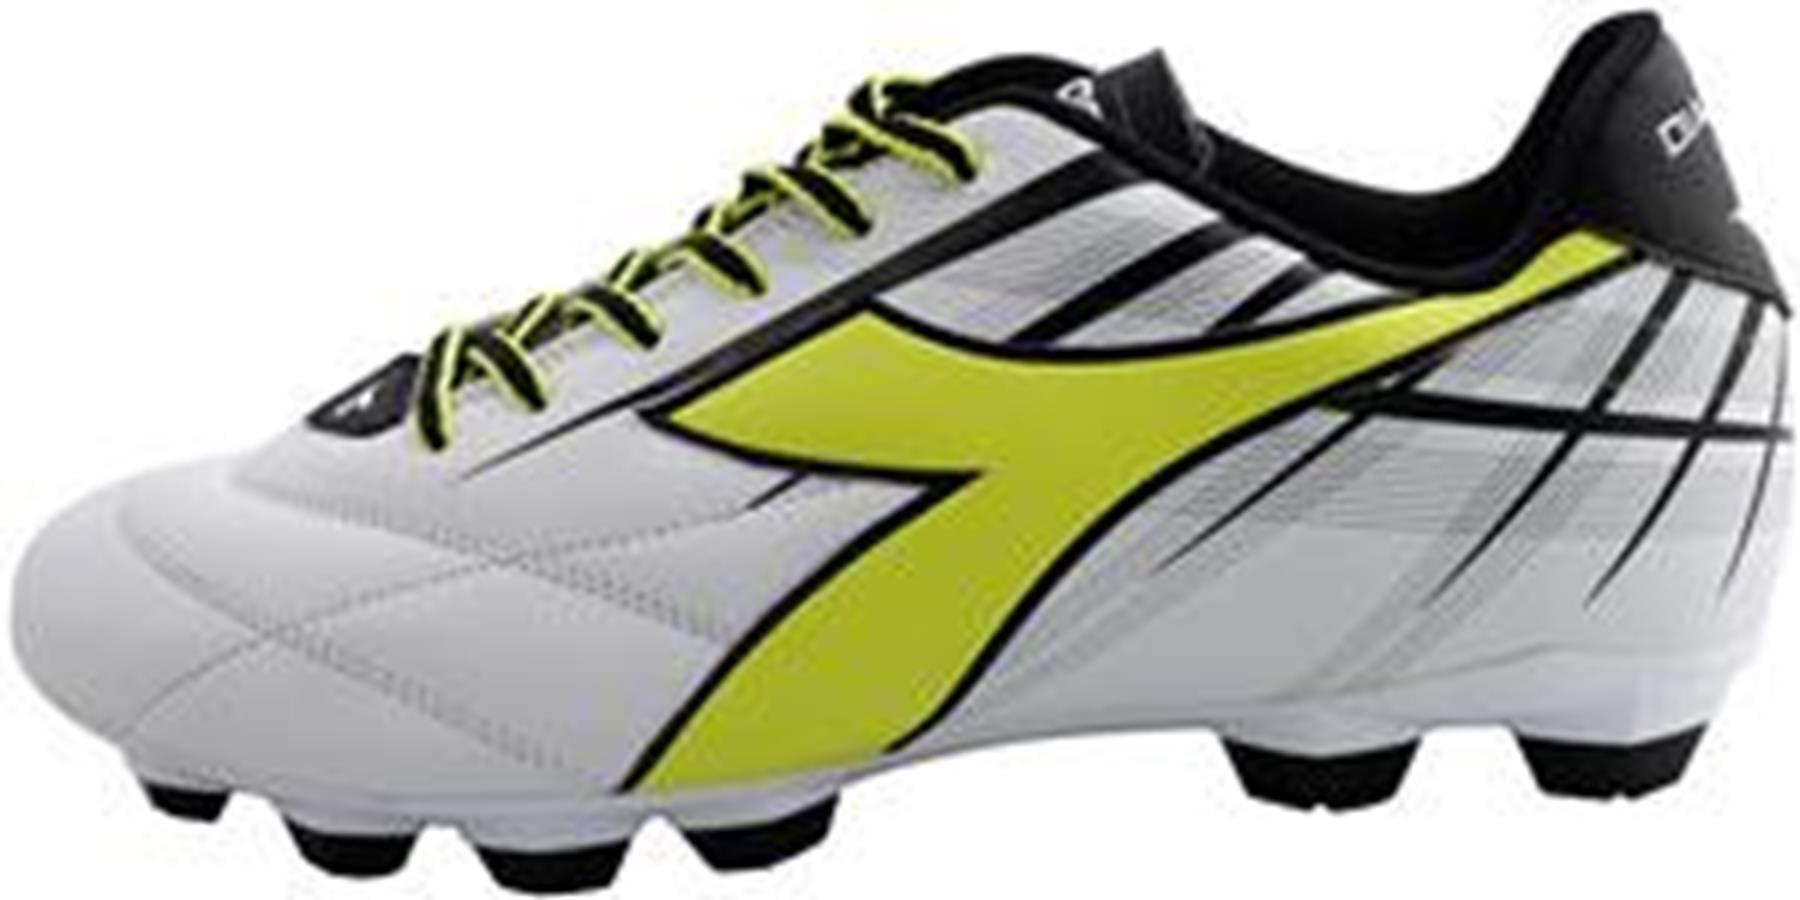 Diadora Men's Forte MD LPU Athletic Soccer Cleats White Polyurethane 10.5 M